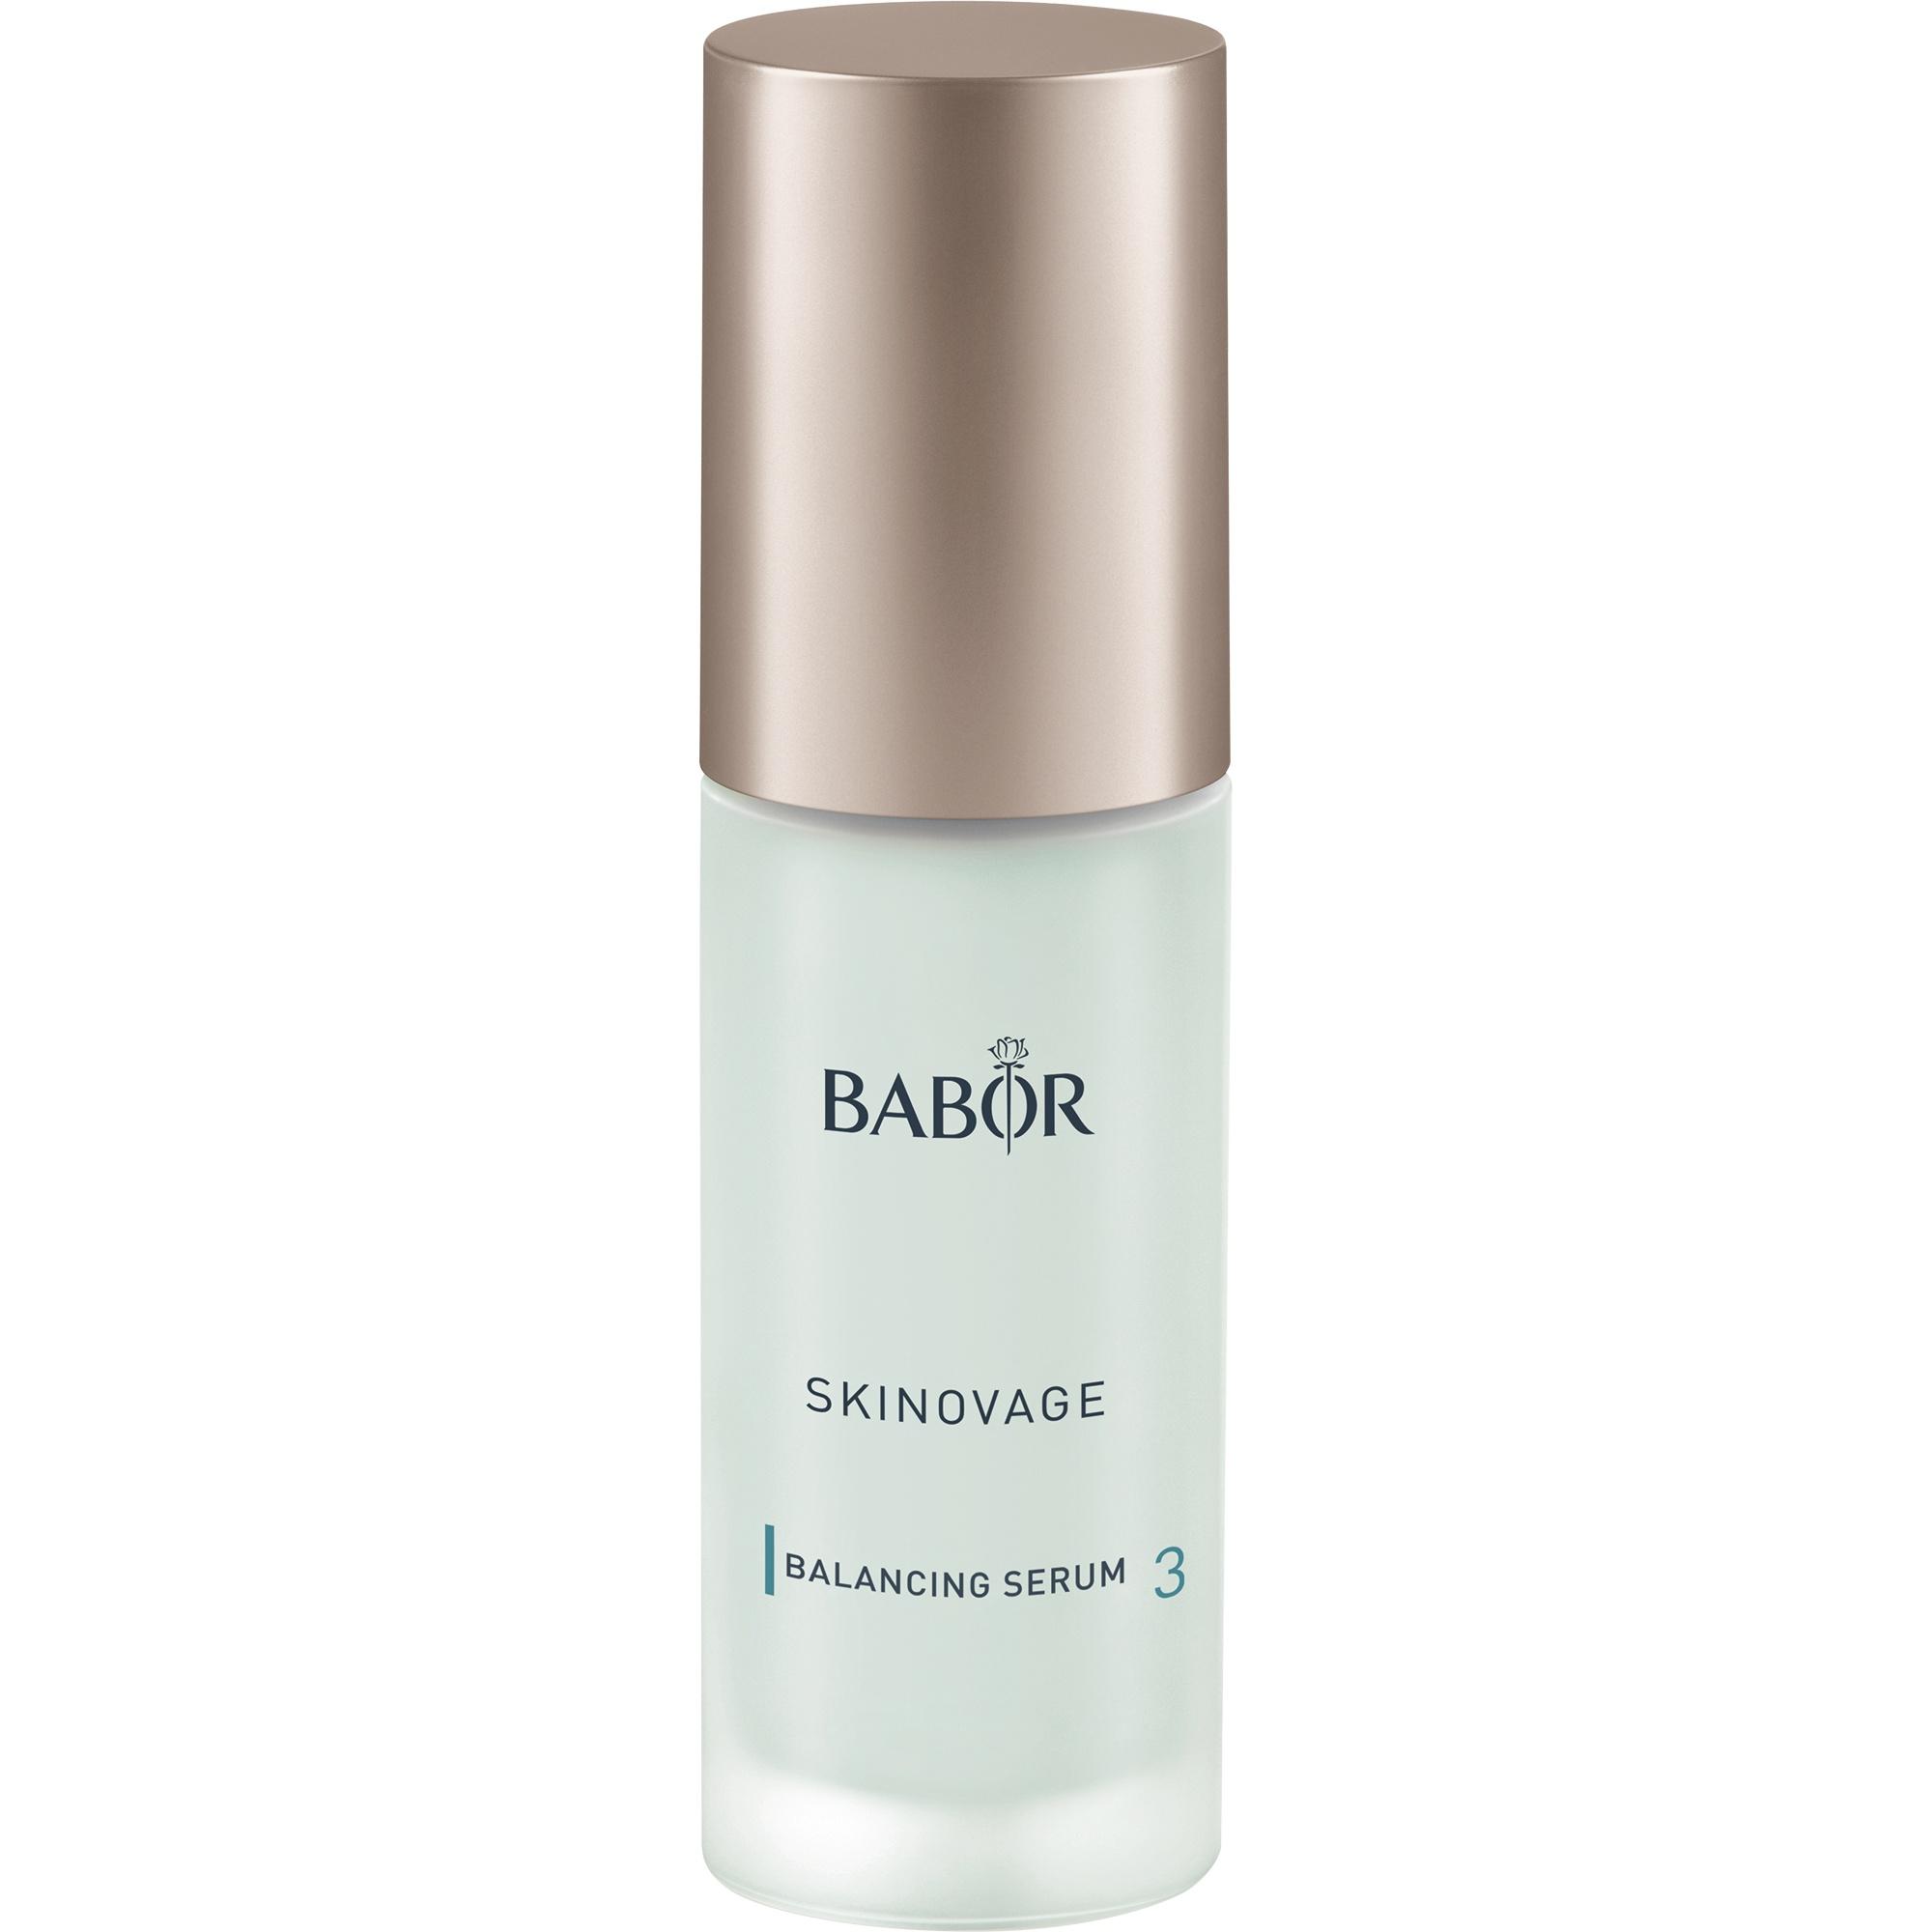 Skinovage Balancing Serum 30ml